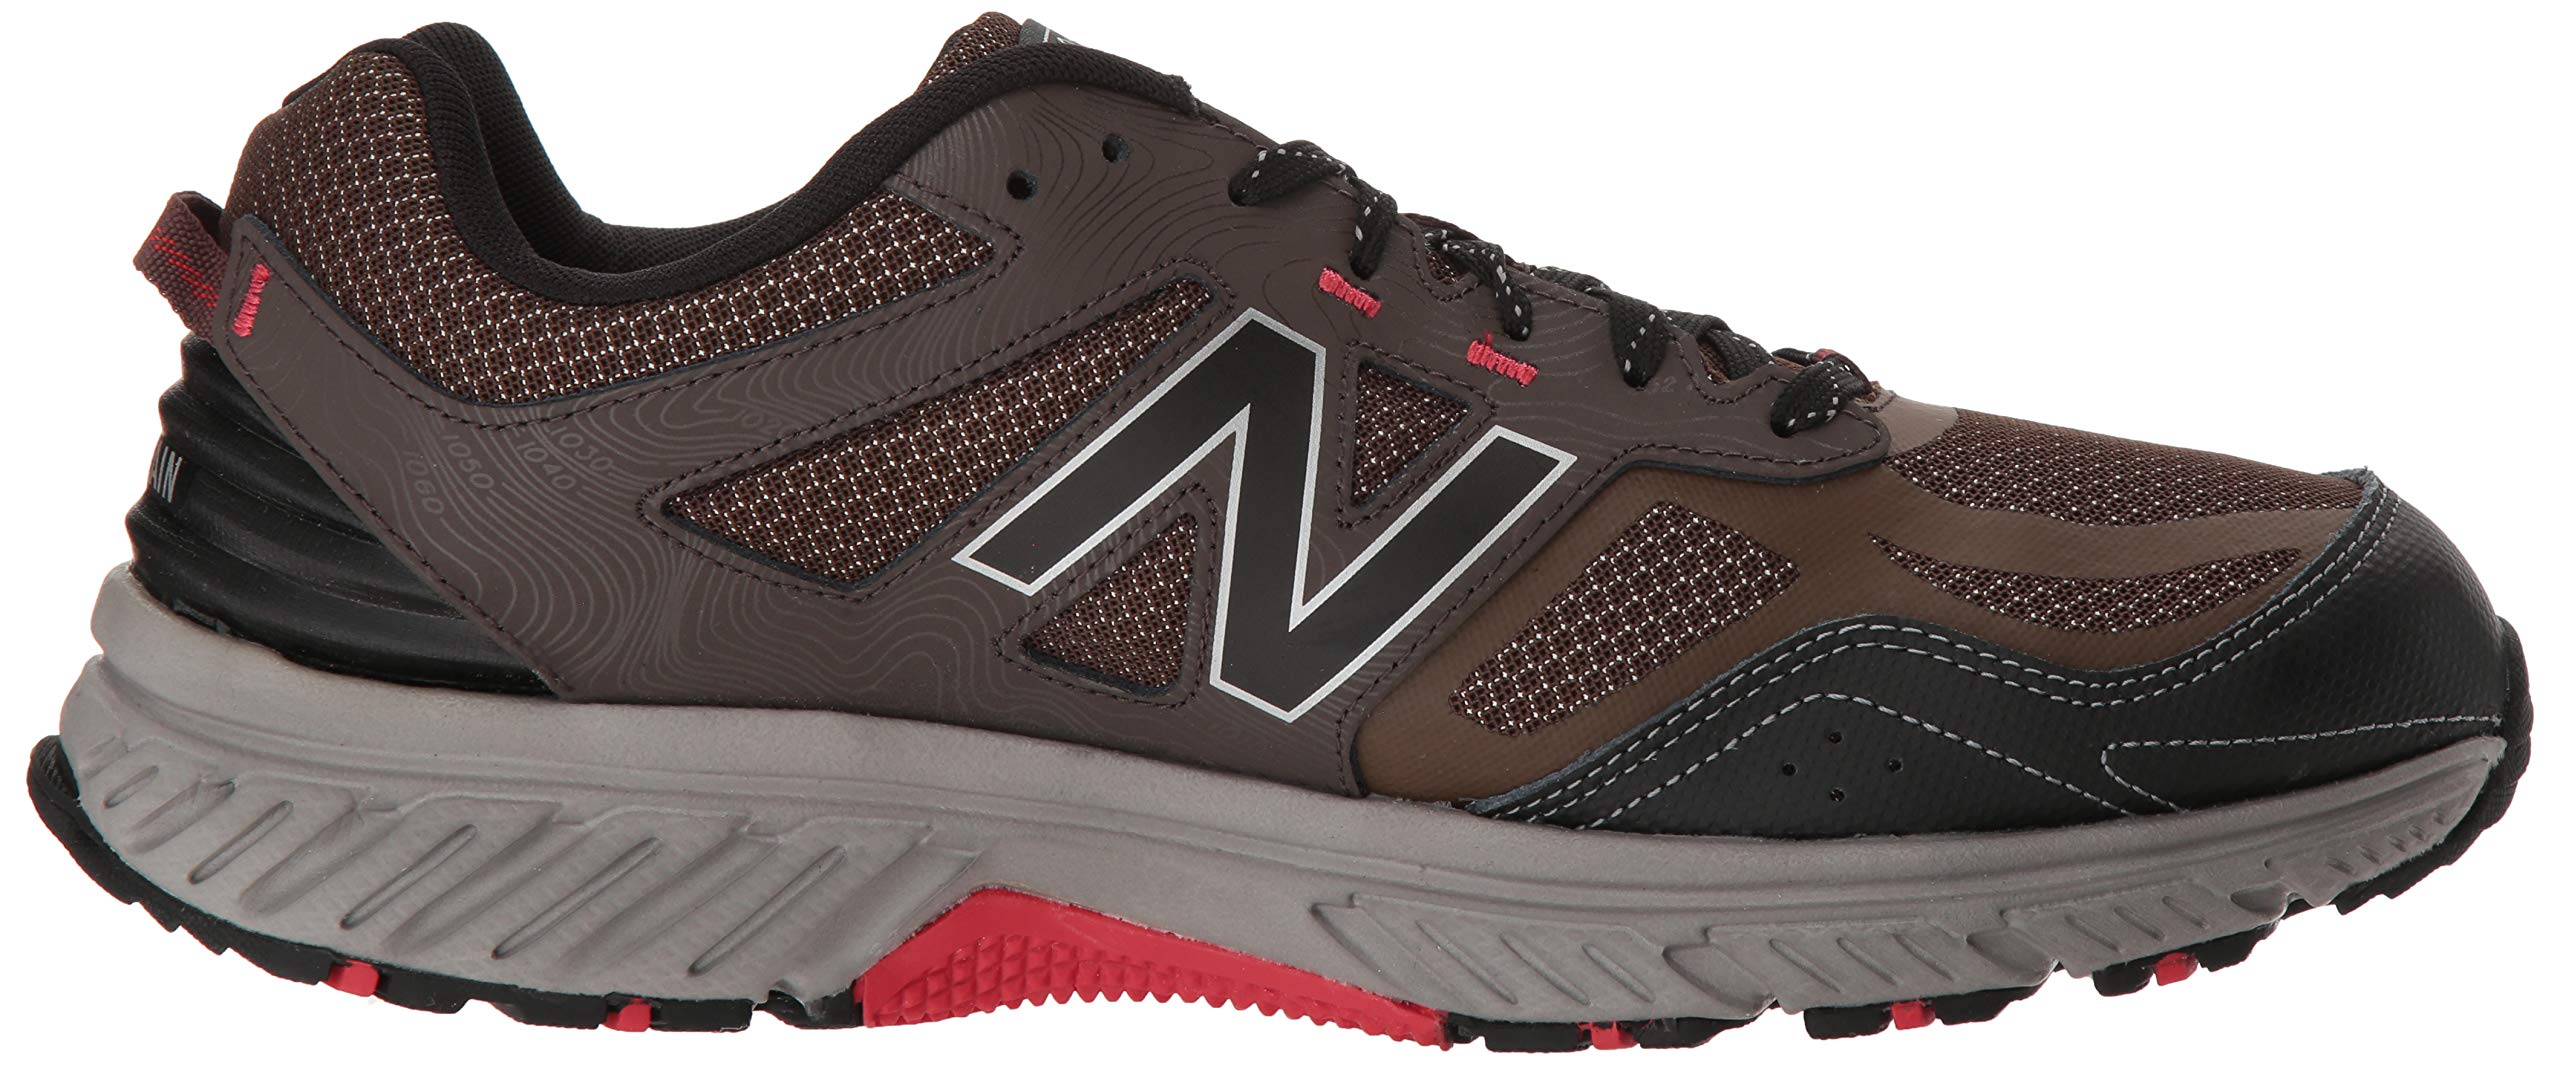 New Balance Men's 510v4 Cushioning Trail Running Shoe, Chocolate/Black/Team red, 7 D US by New Balance (Image #7)